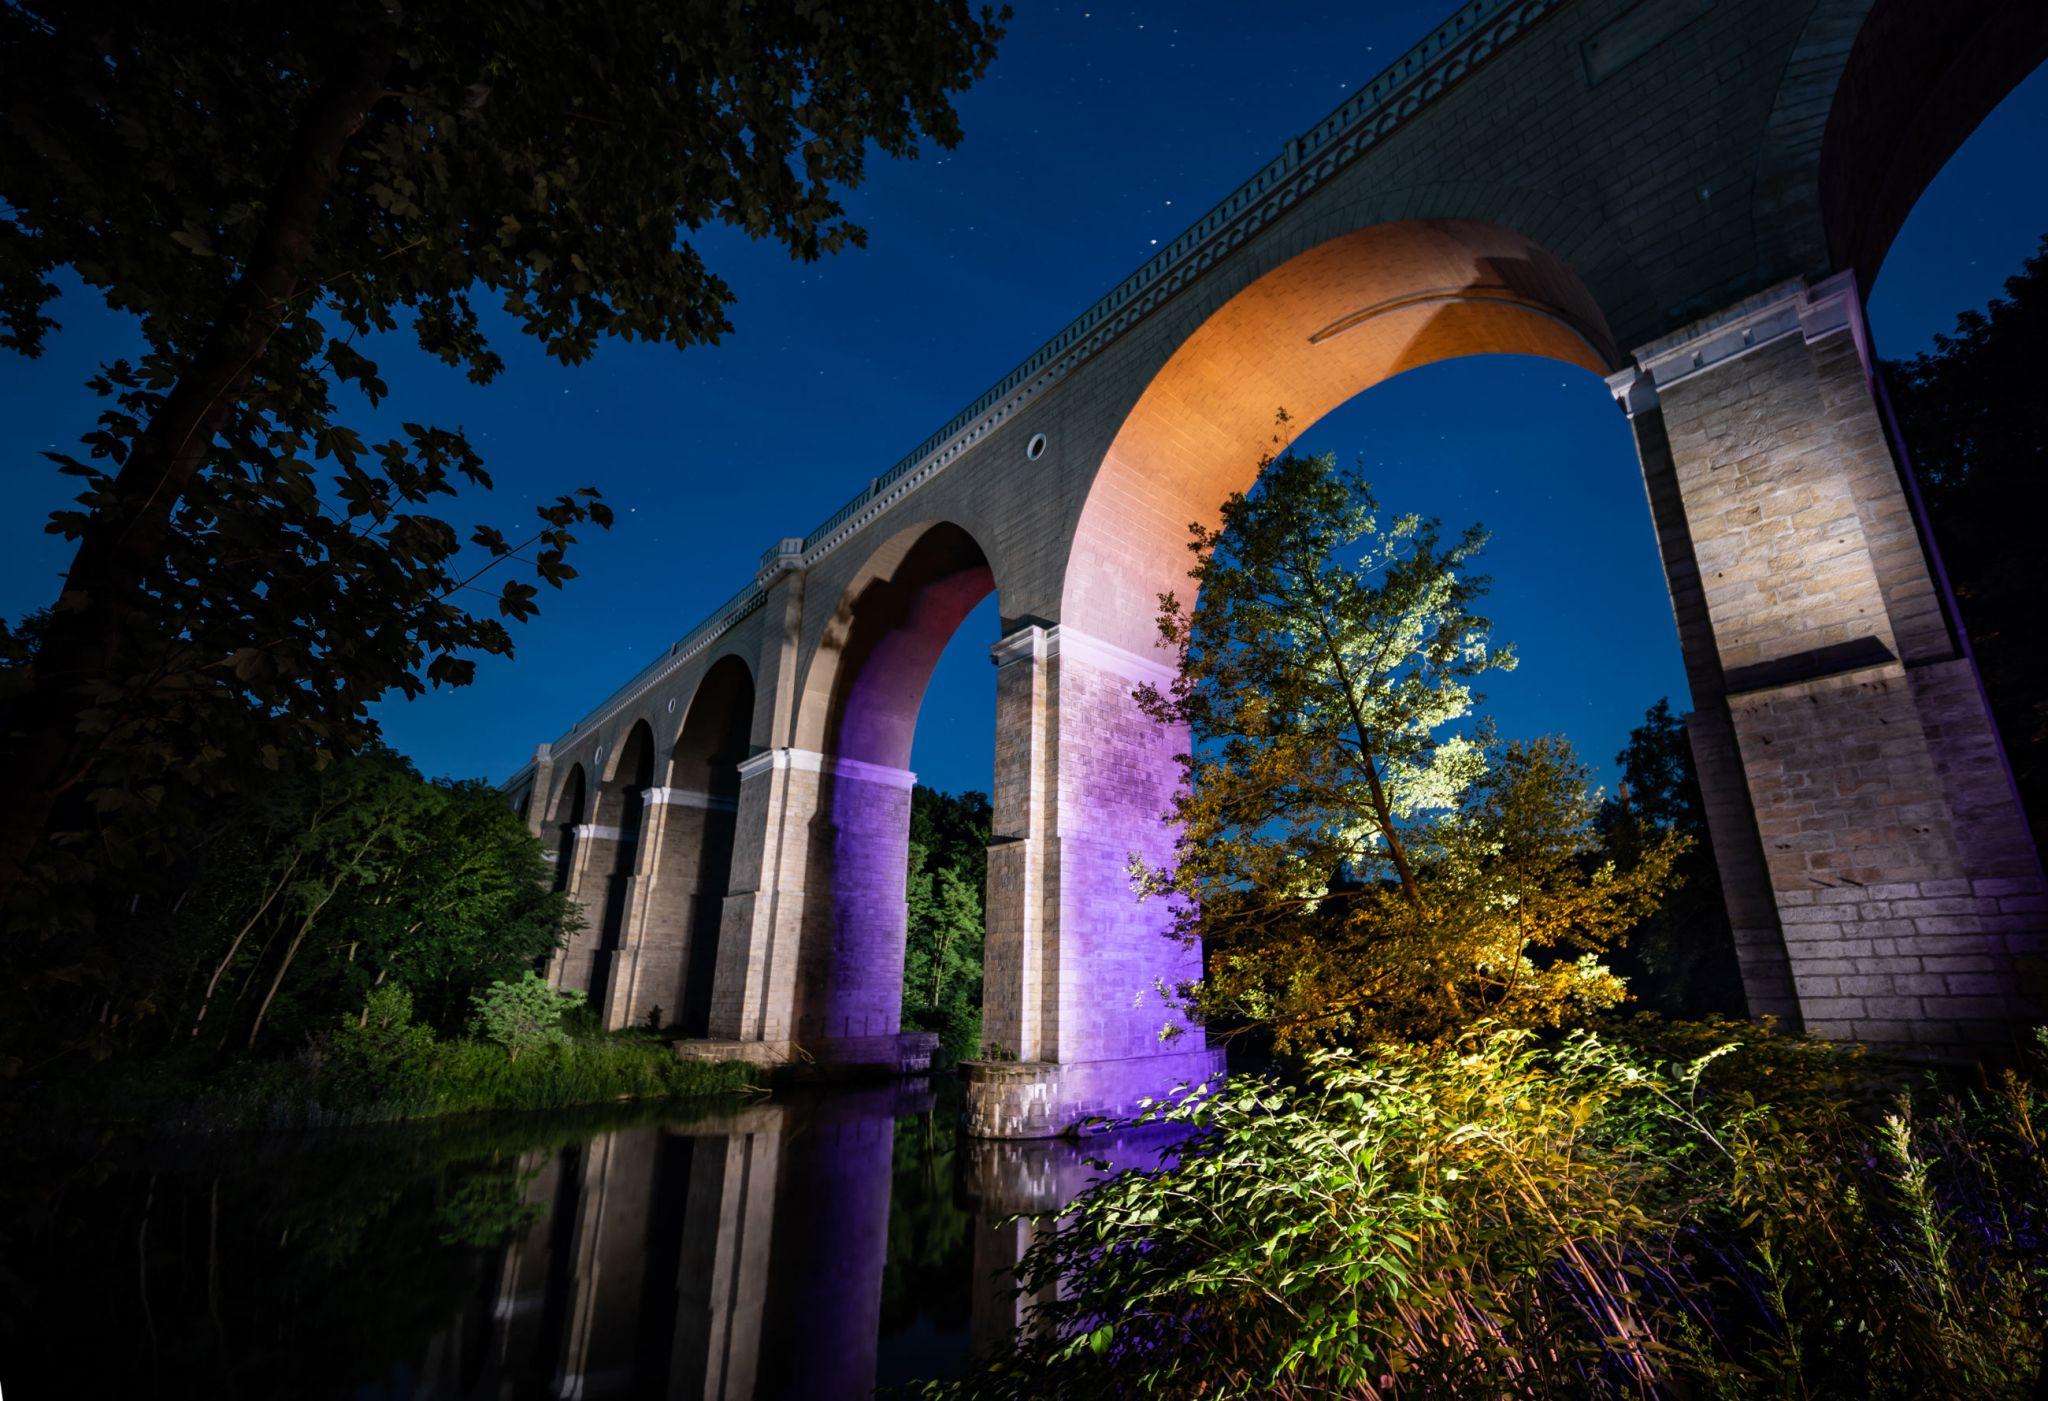 Neisse Viaduct, Germany